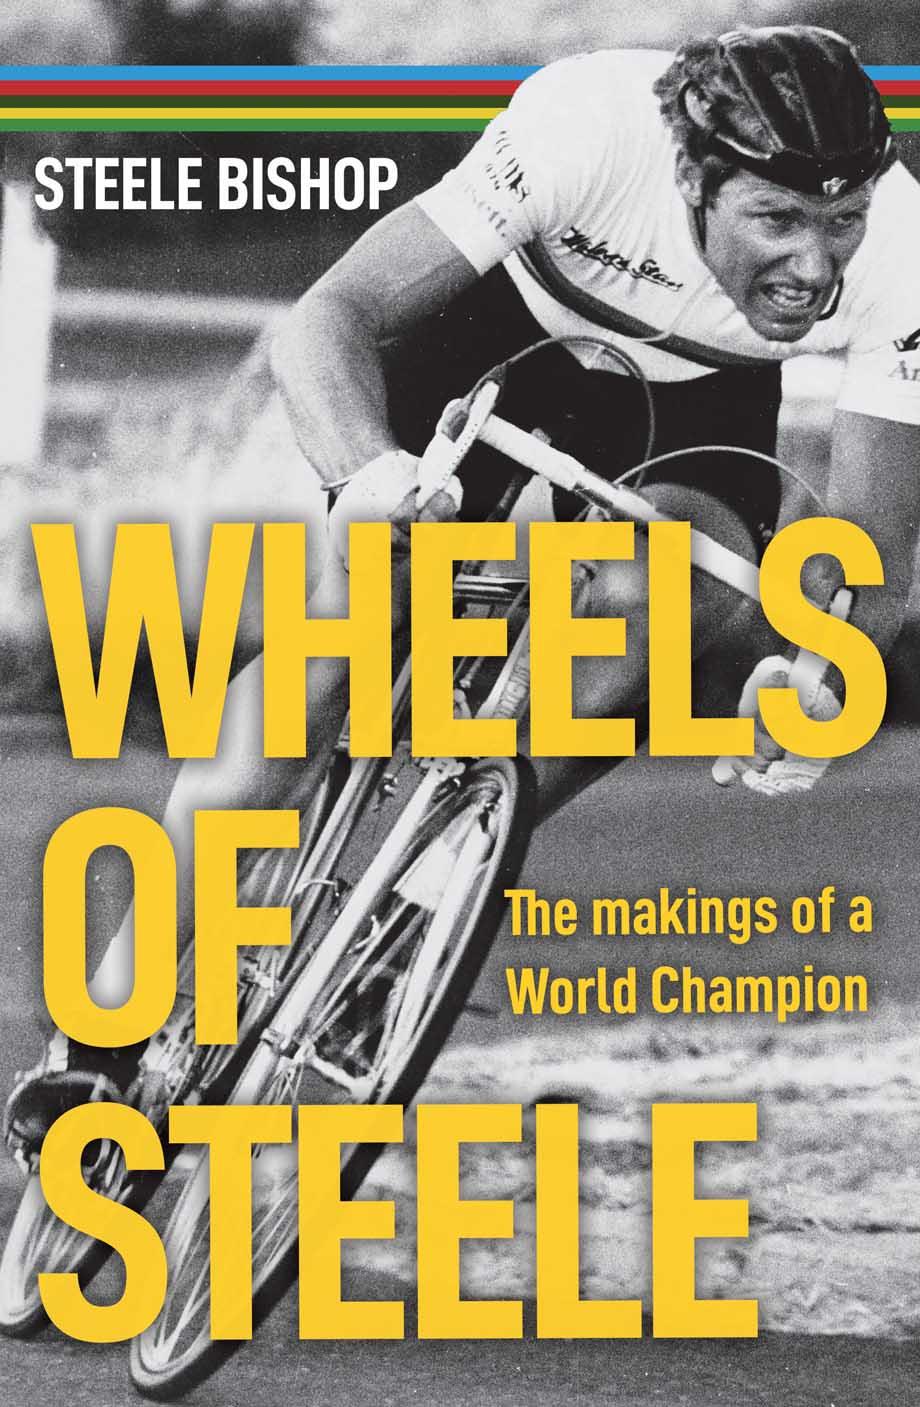 PEZ Bookshelf: Wheels of Steele - PezCycling News